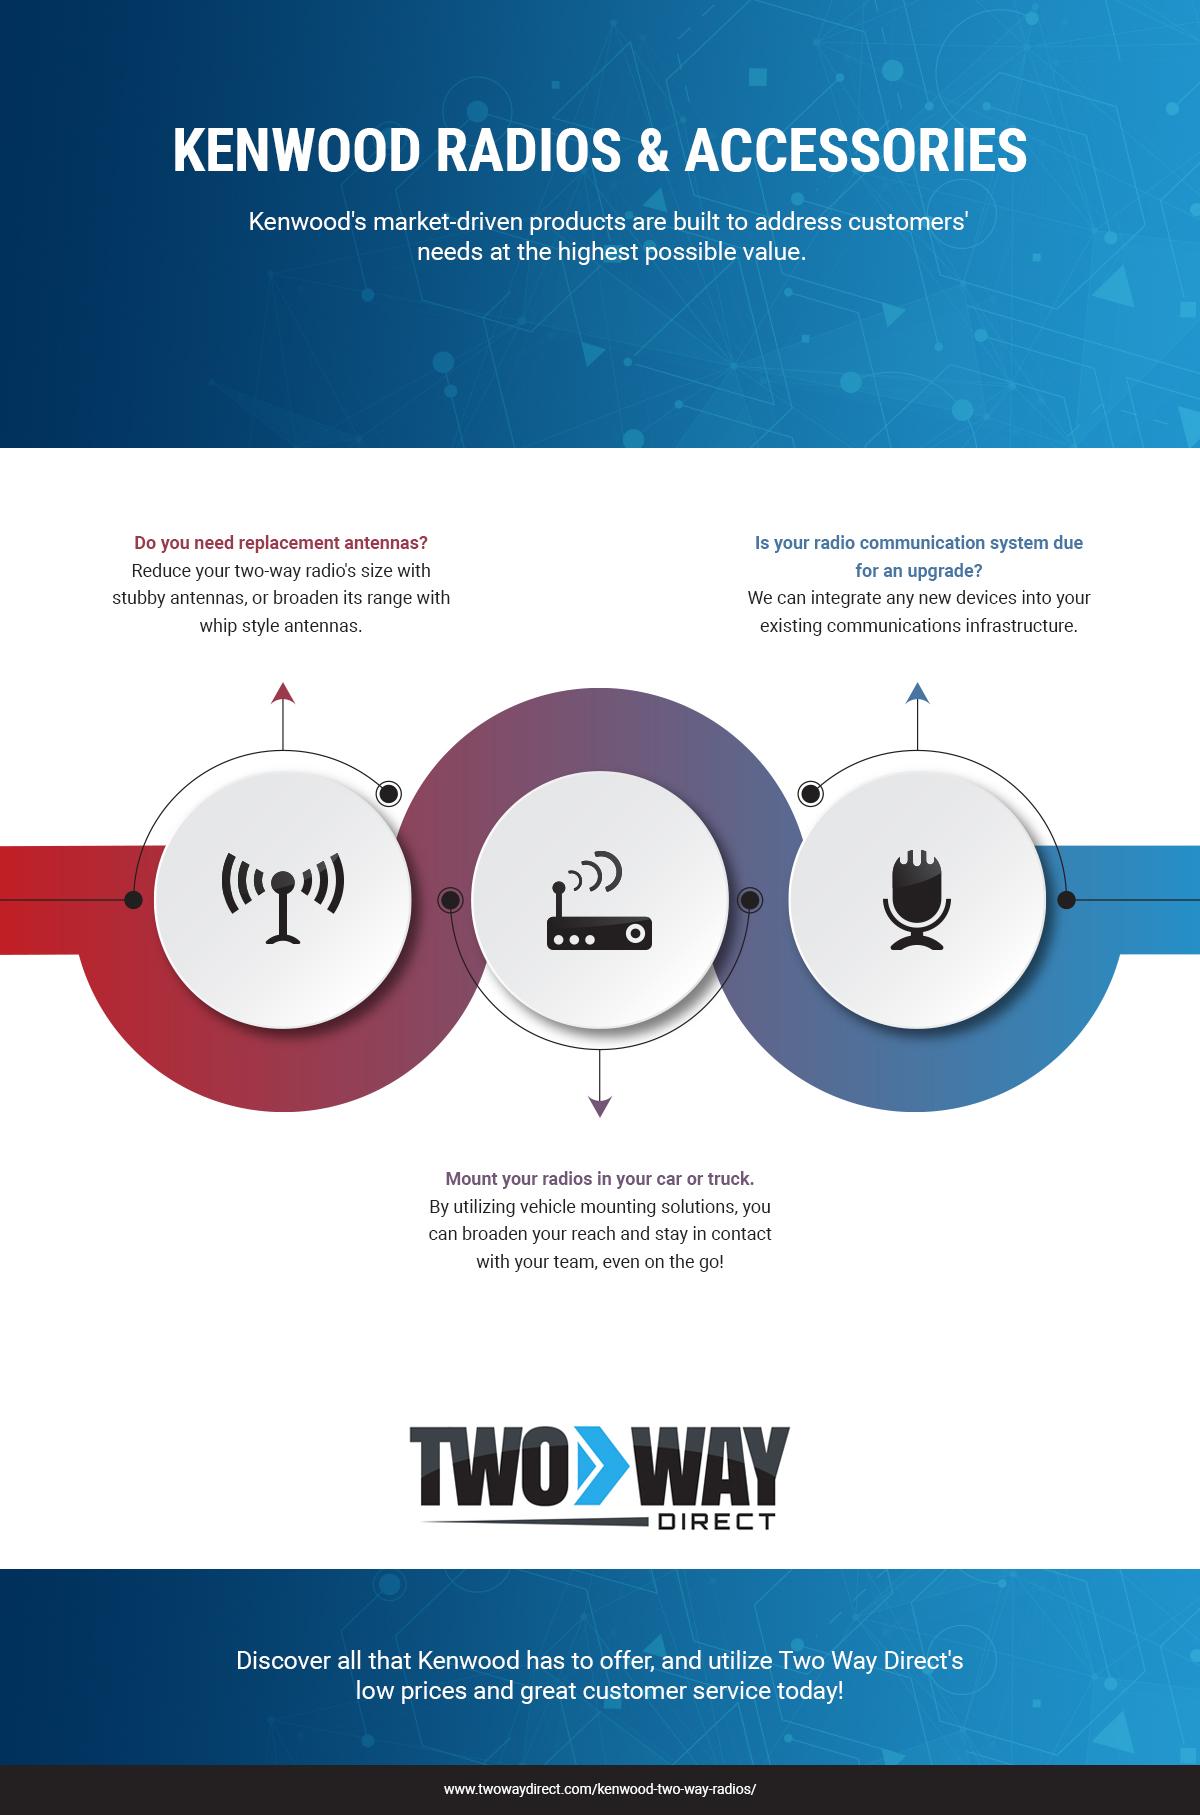 kenwood-infographic.jpg